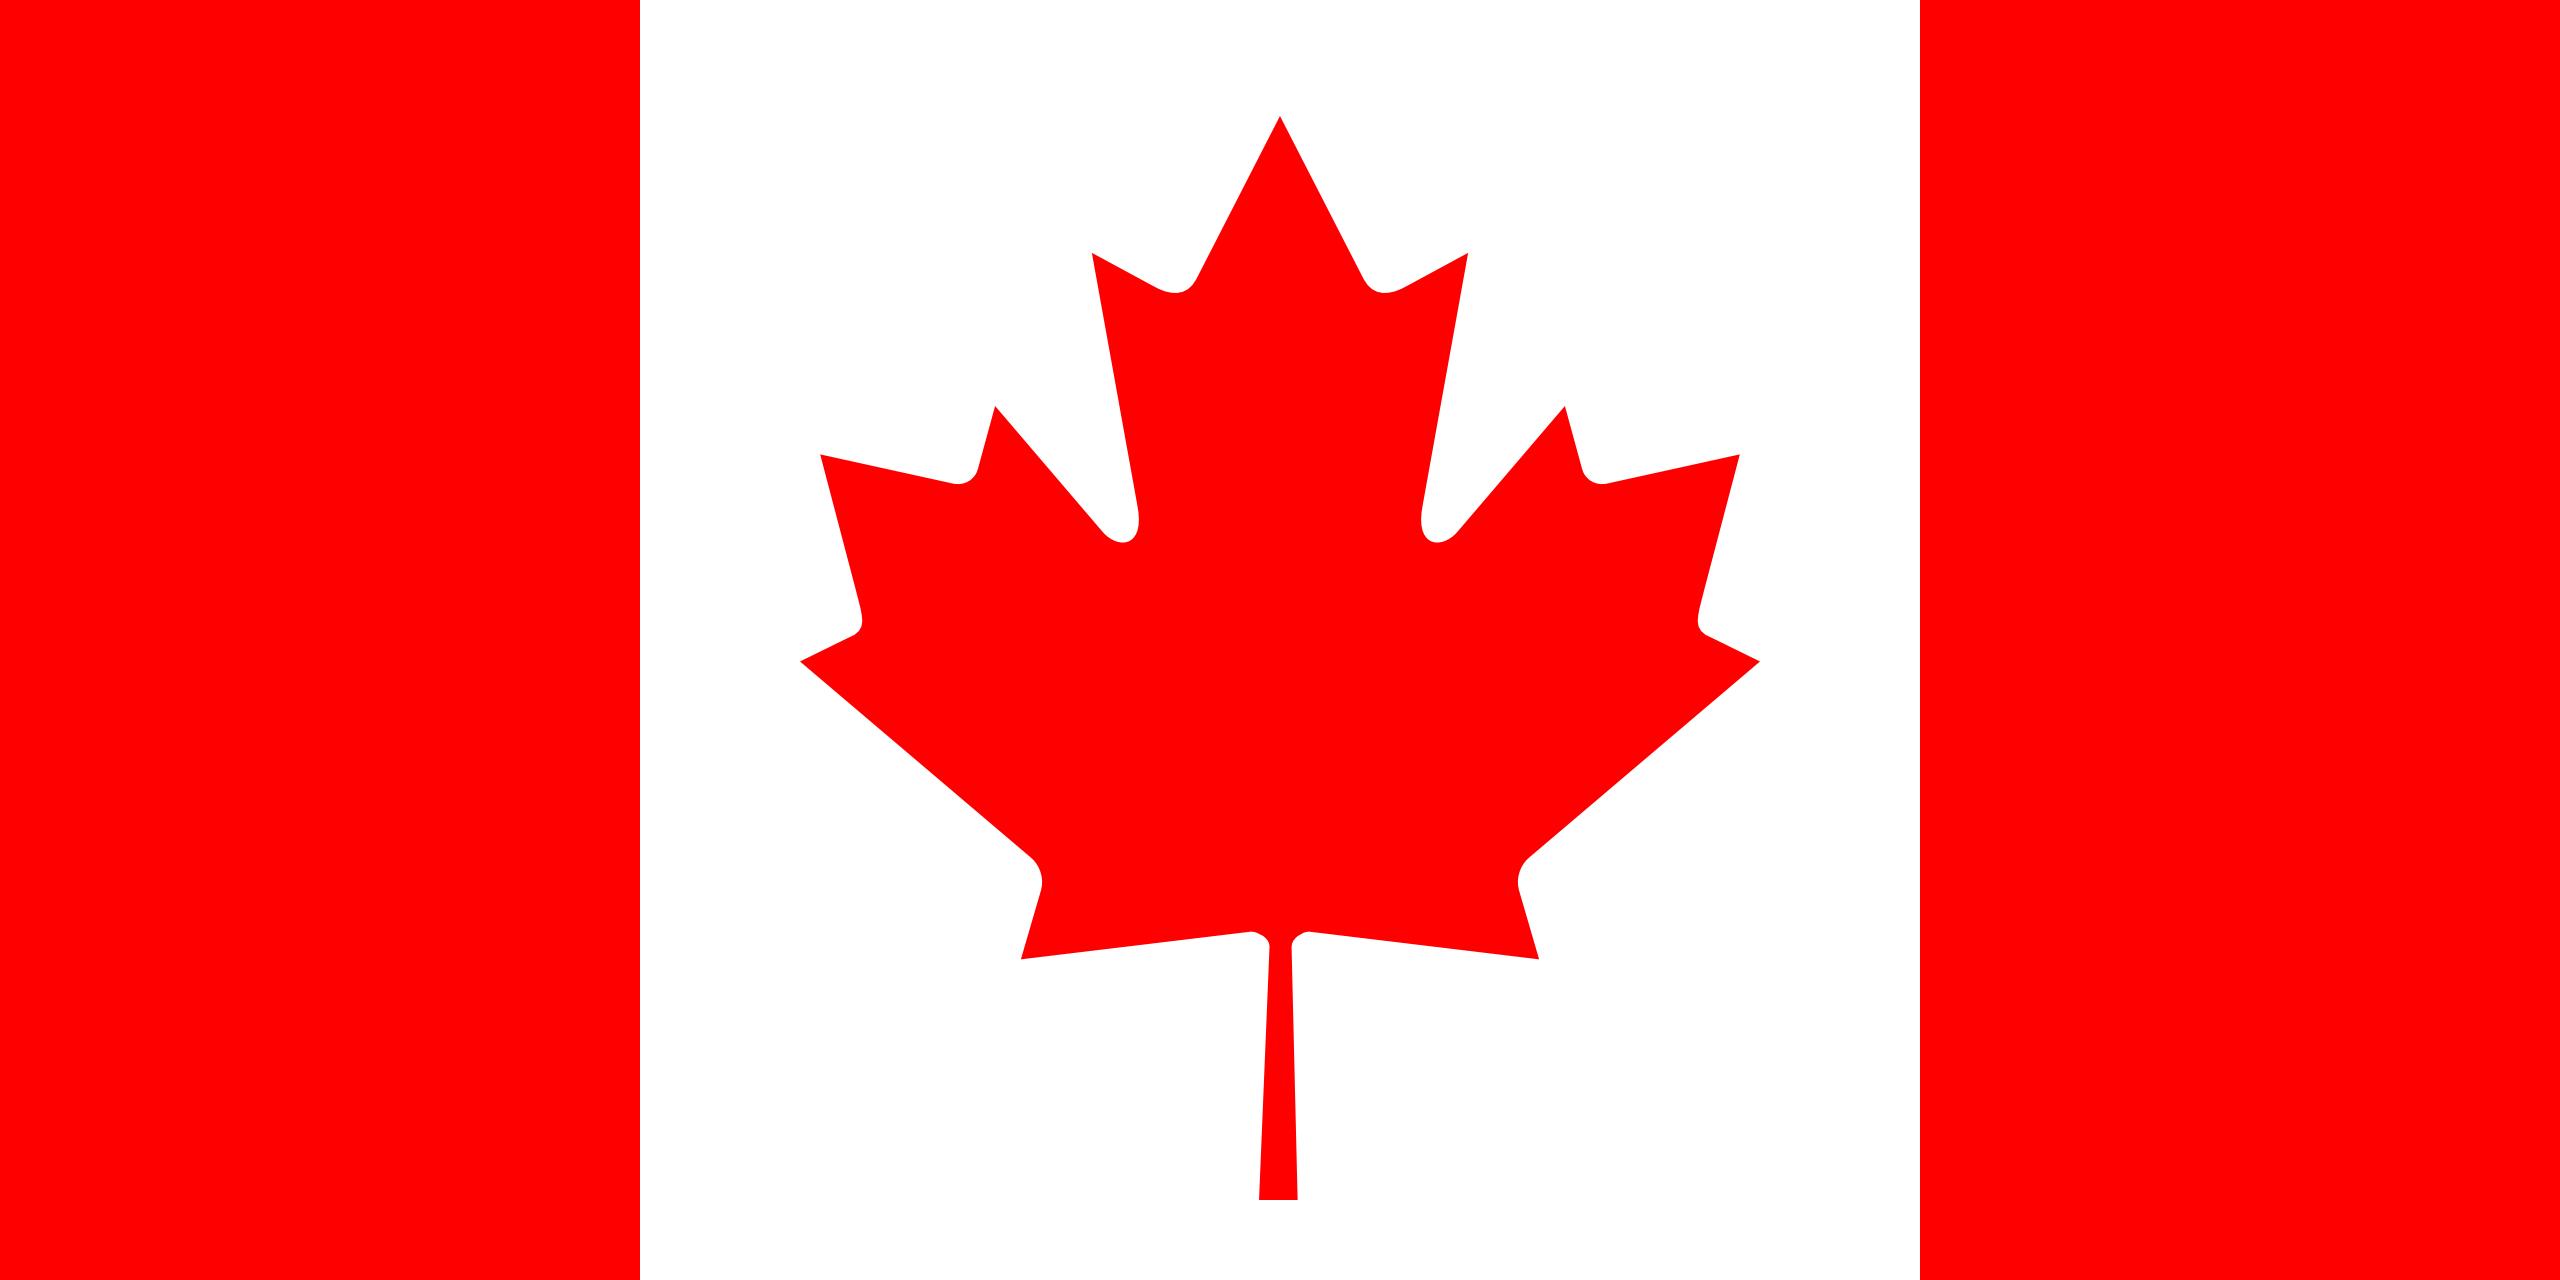 canadá, país, emblema, insignia, σύμβολο - Wallpapers HD - Professor-falken.com